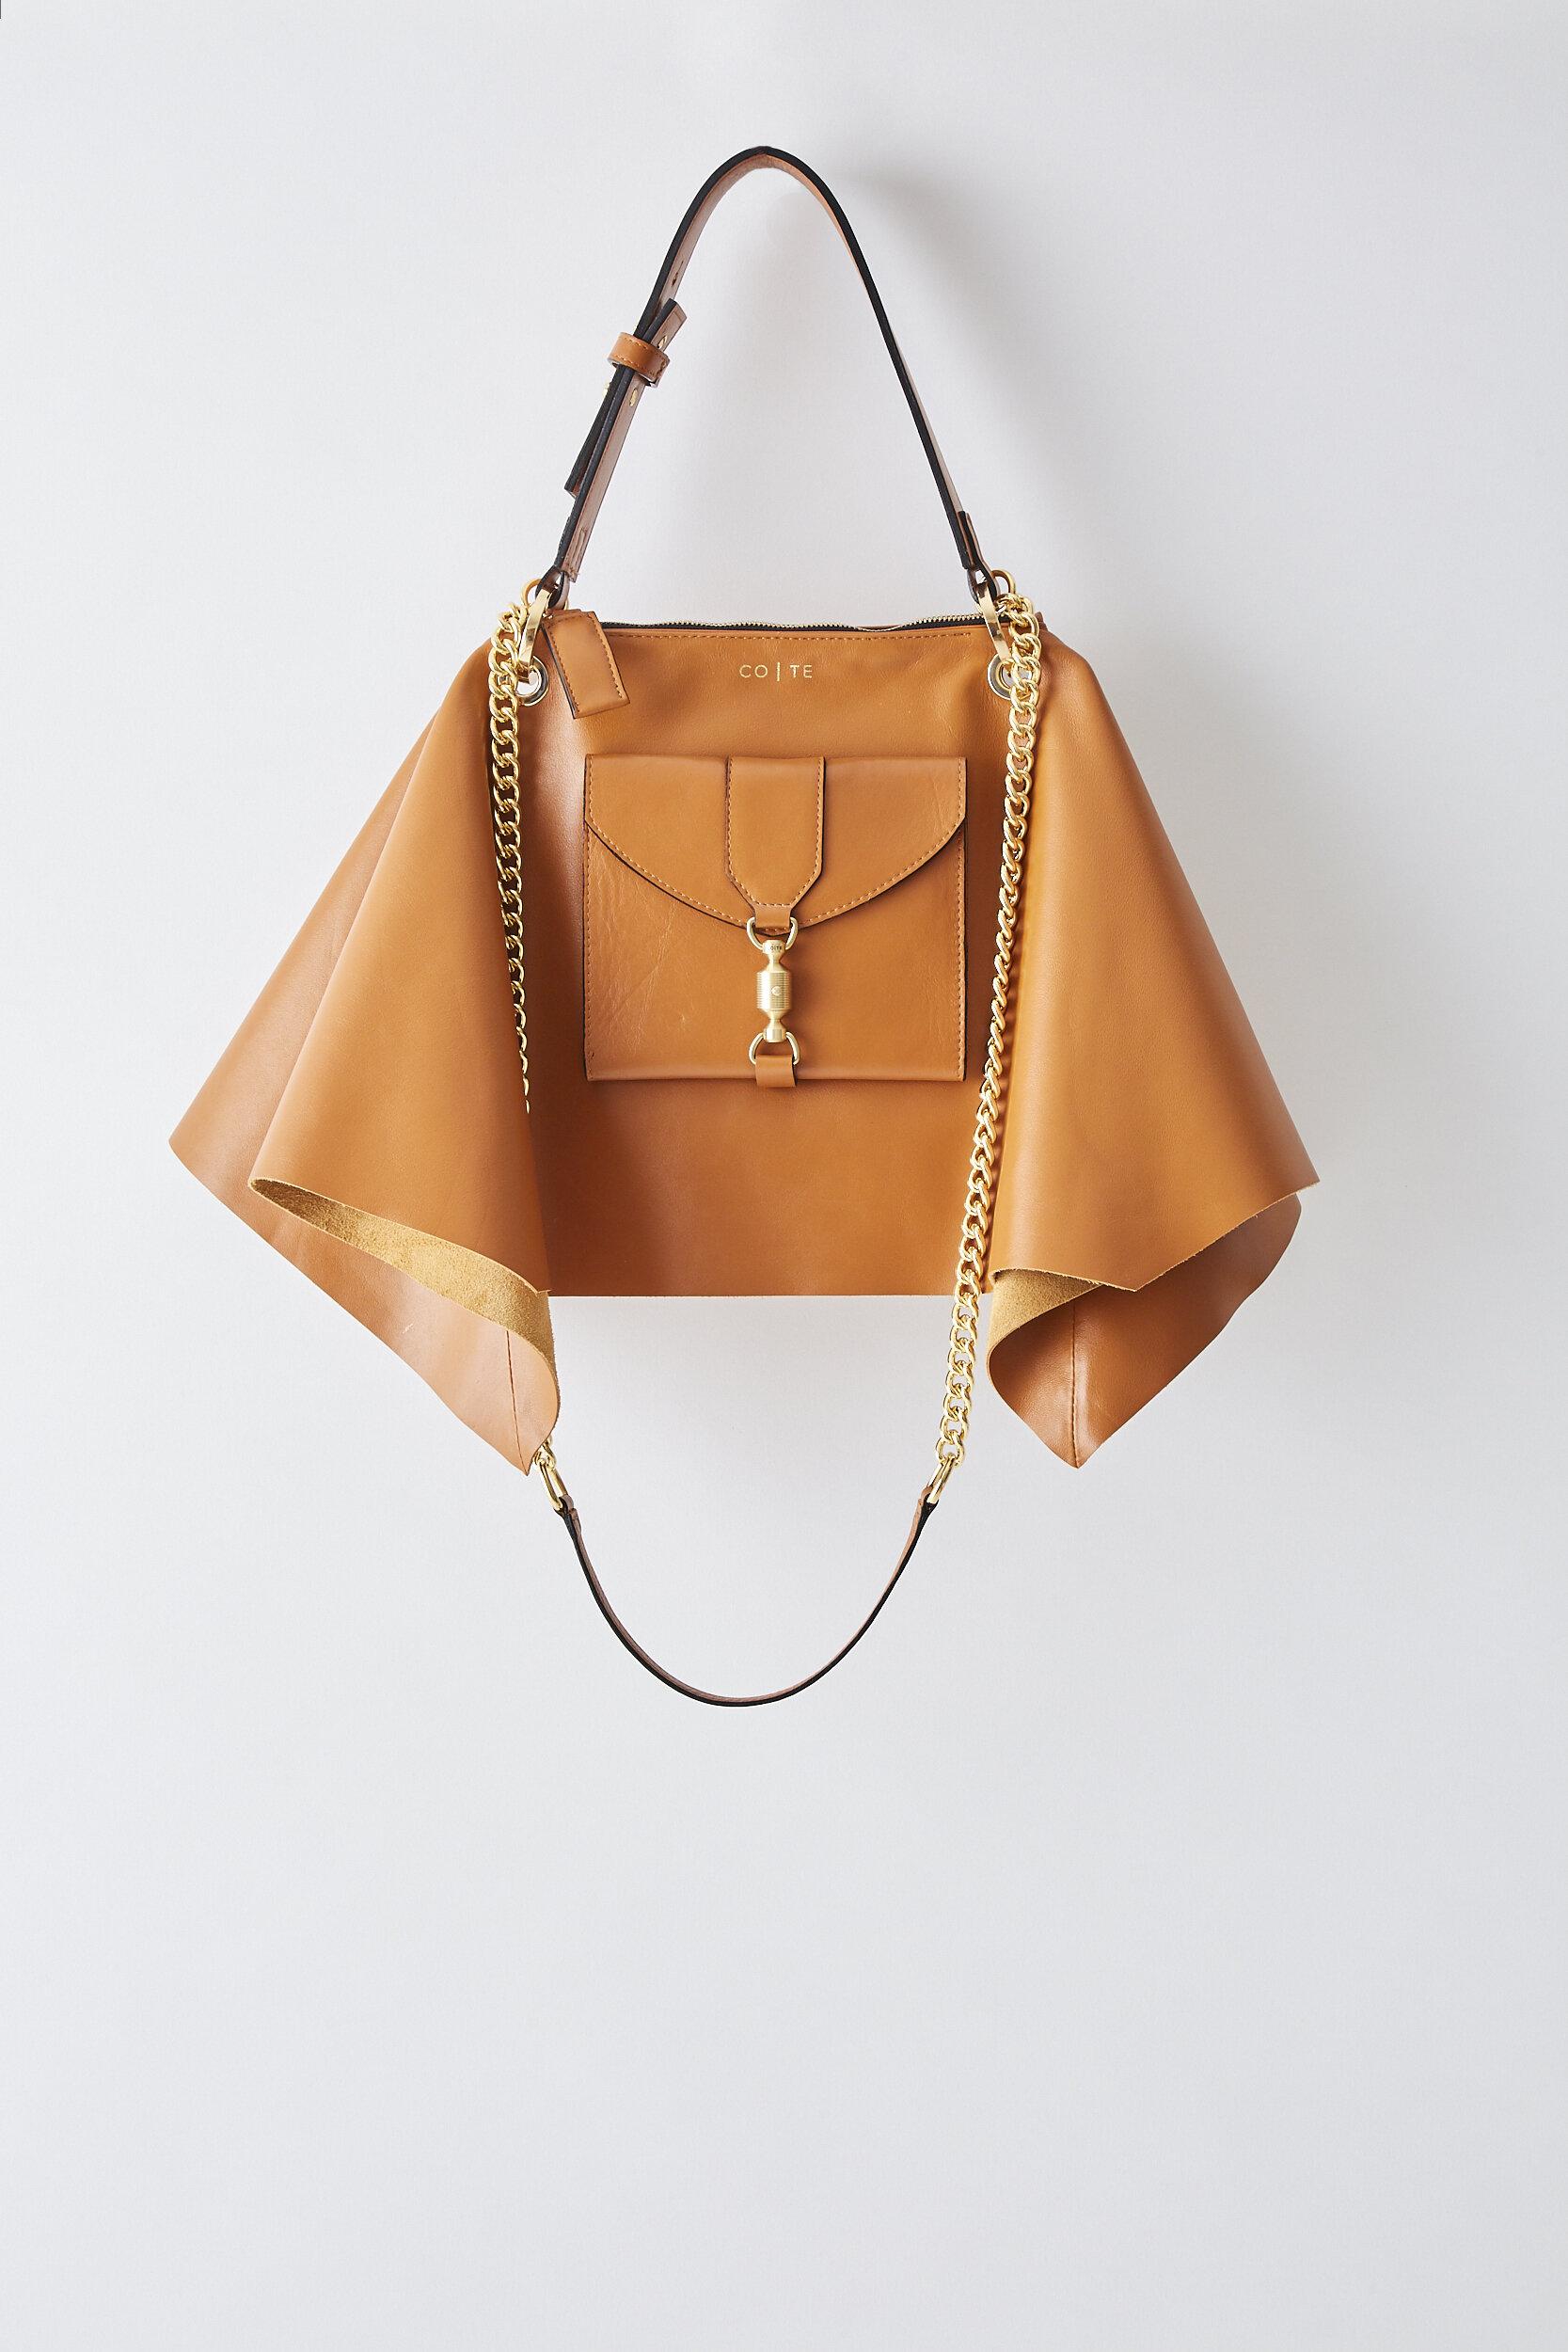 COTE SS2020 Foulard Bag Camel